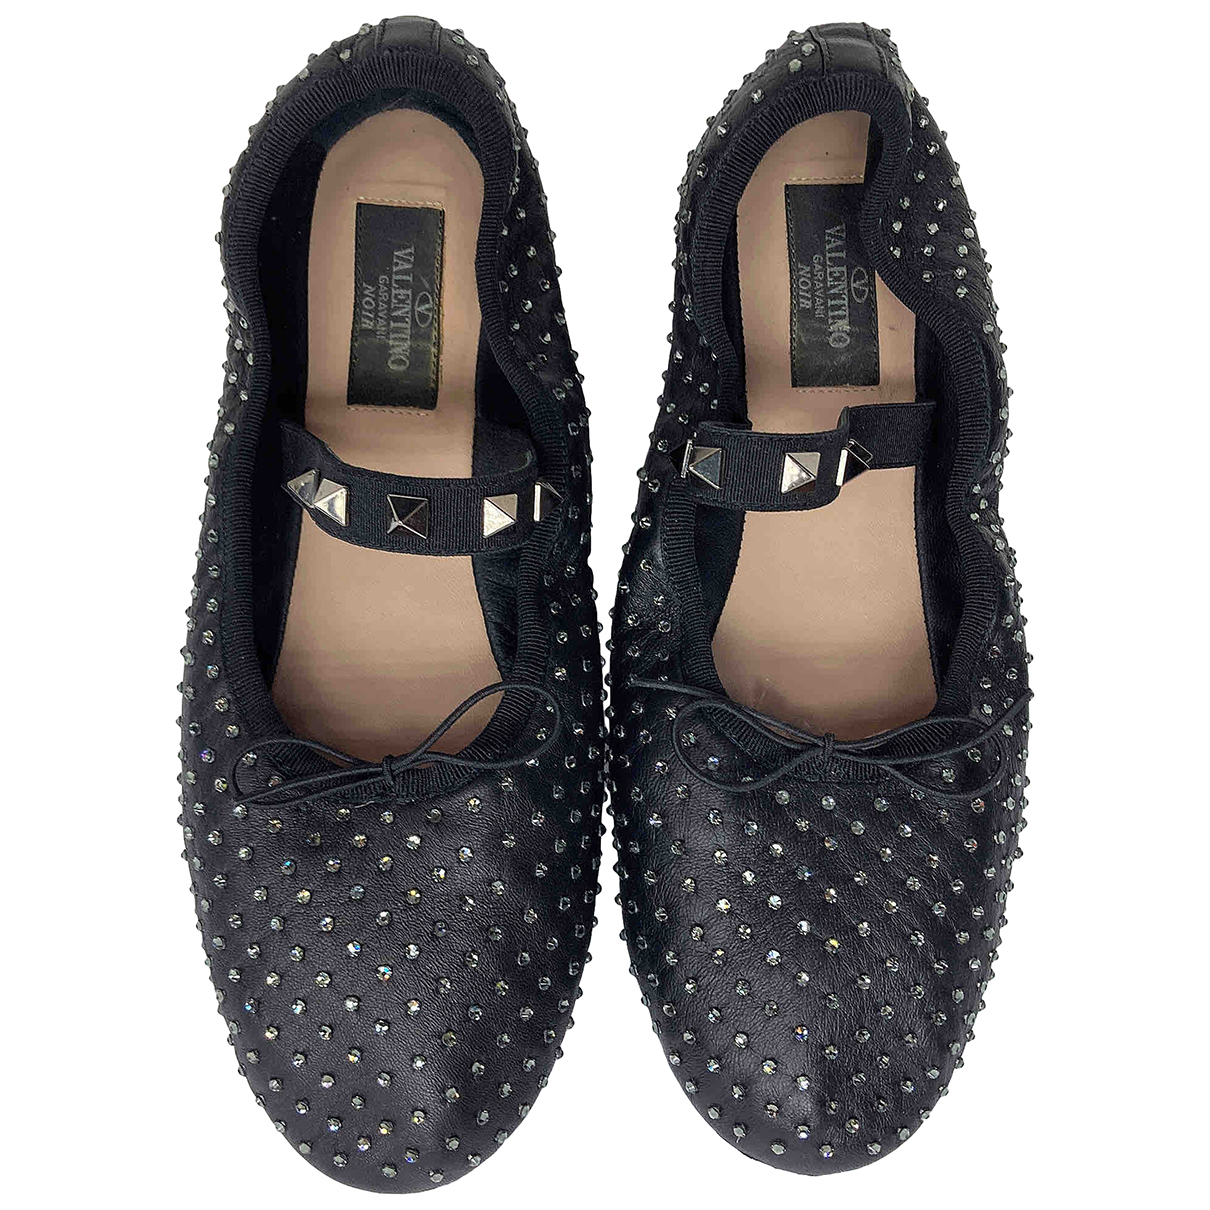 Valentino Garavani N Black Leather Flats for Women 38.5 EU